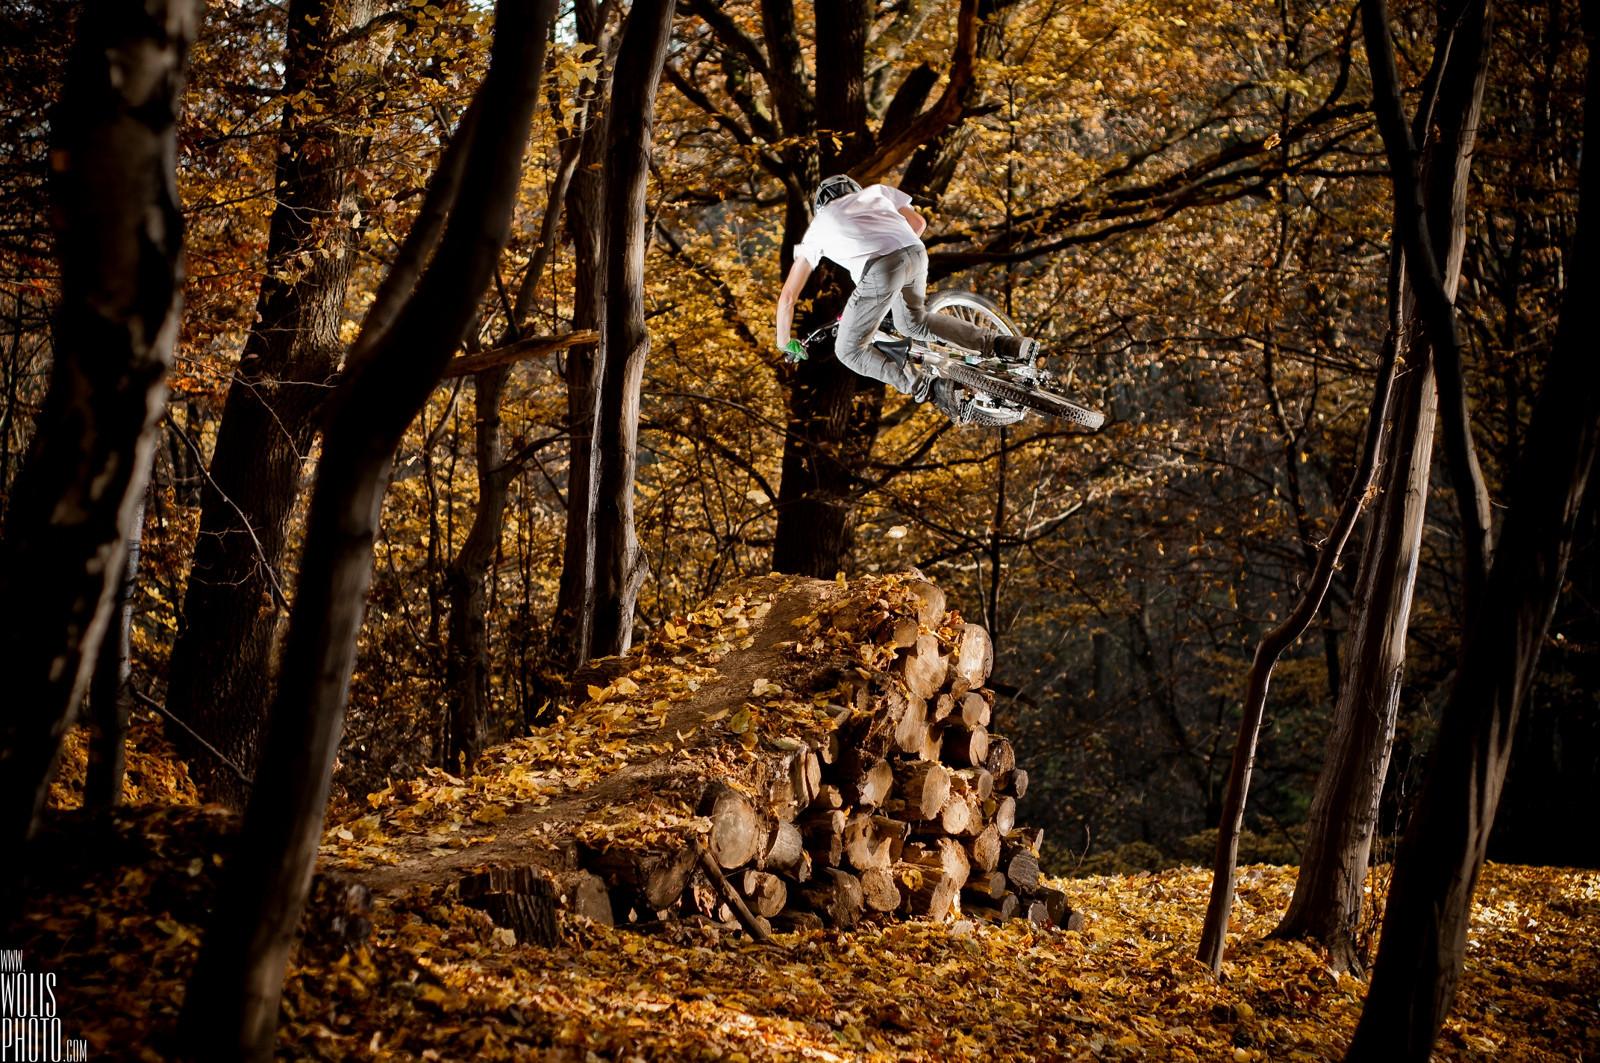 Tabletop - JawsMtb - Mountain Biking Pictures - Vital MTB